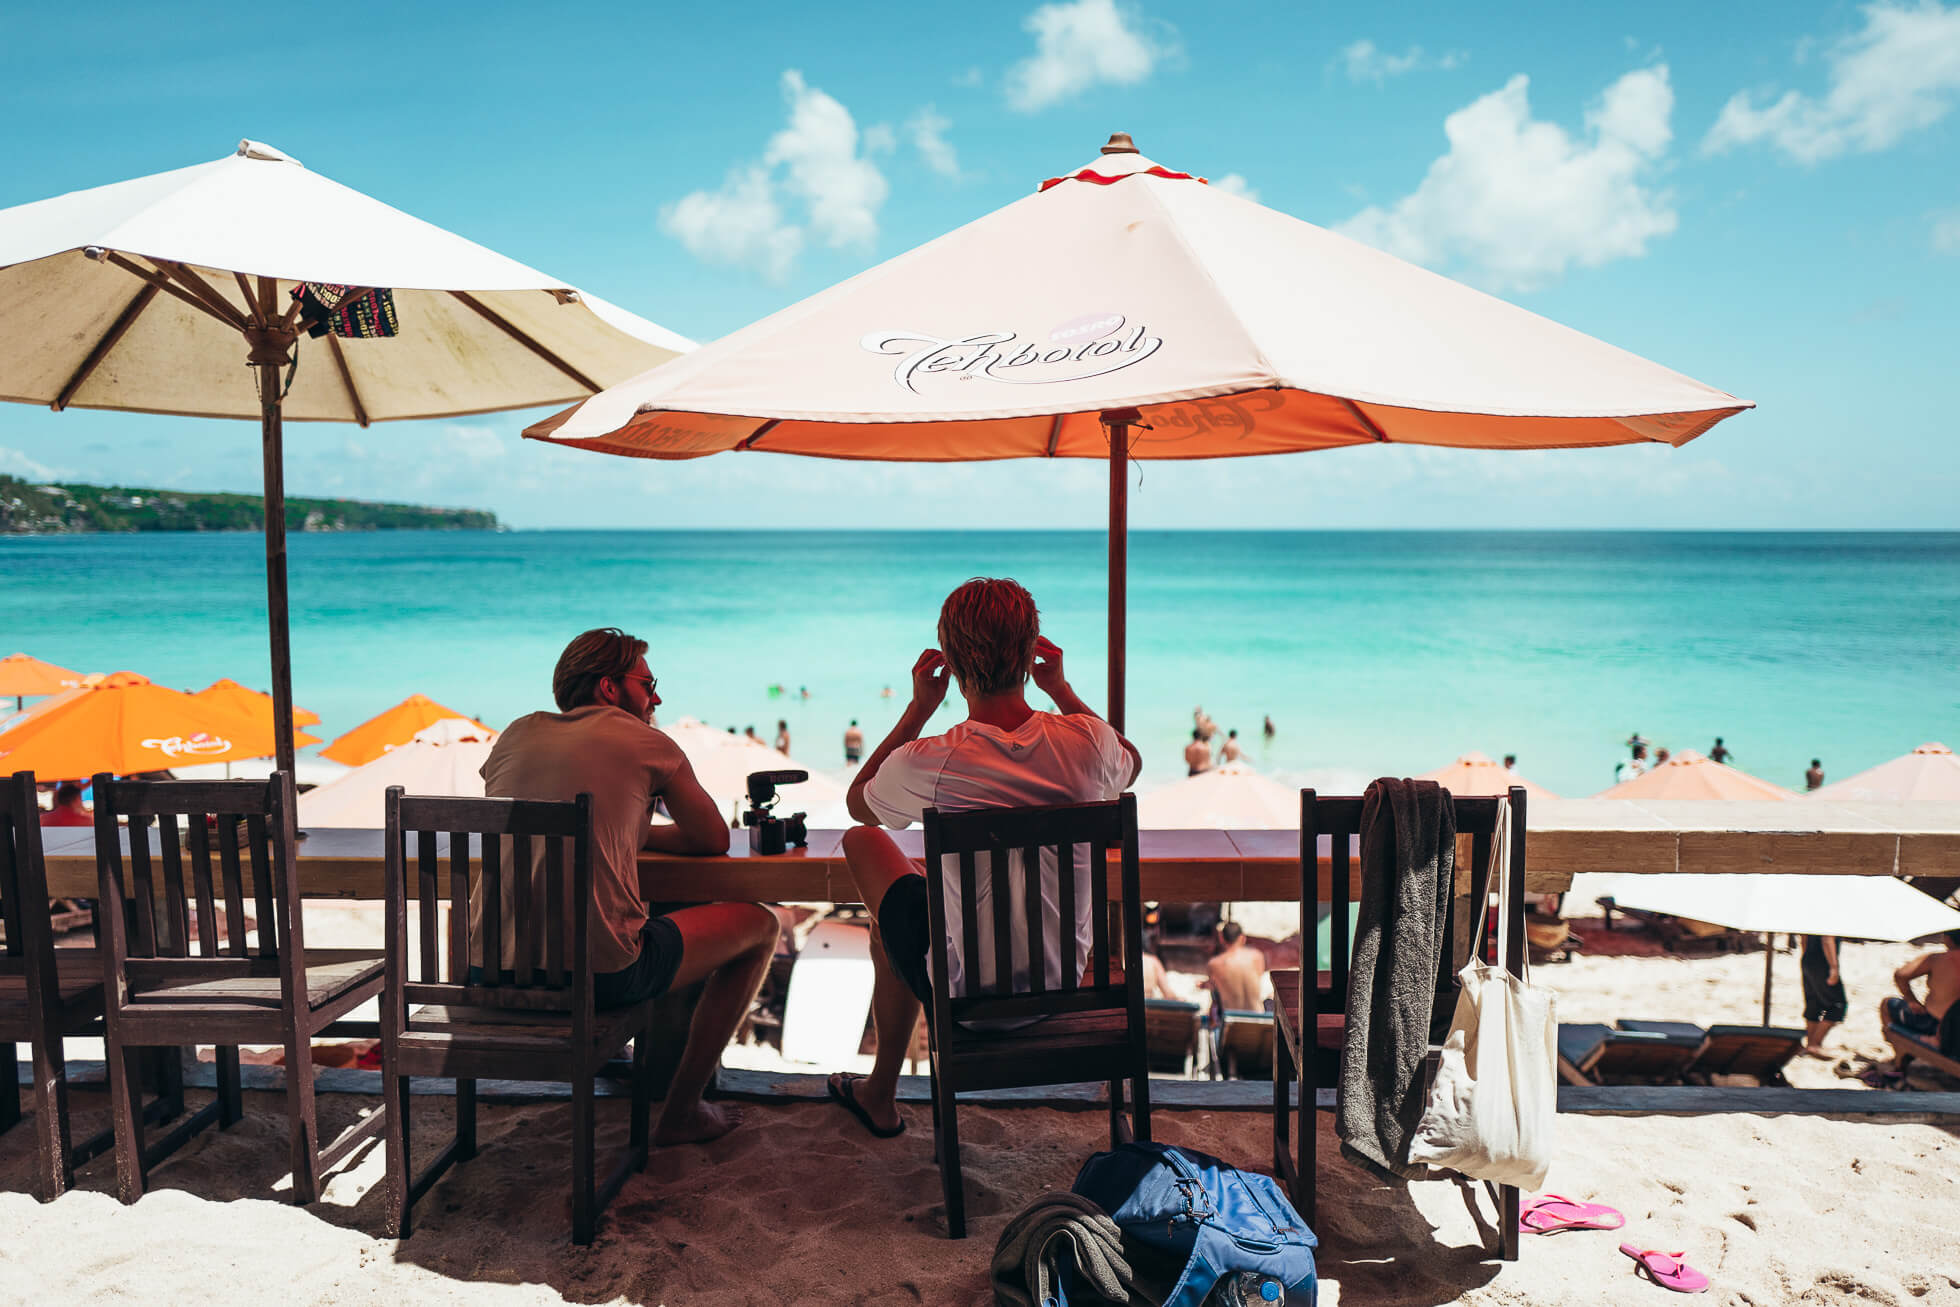 janni-deler-dreamland-beach-baliL1010615